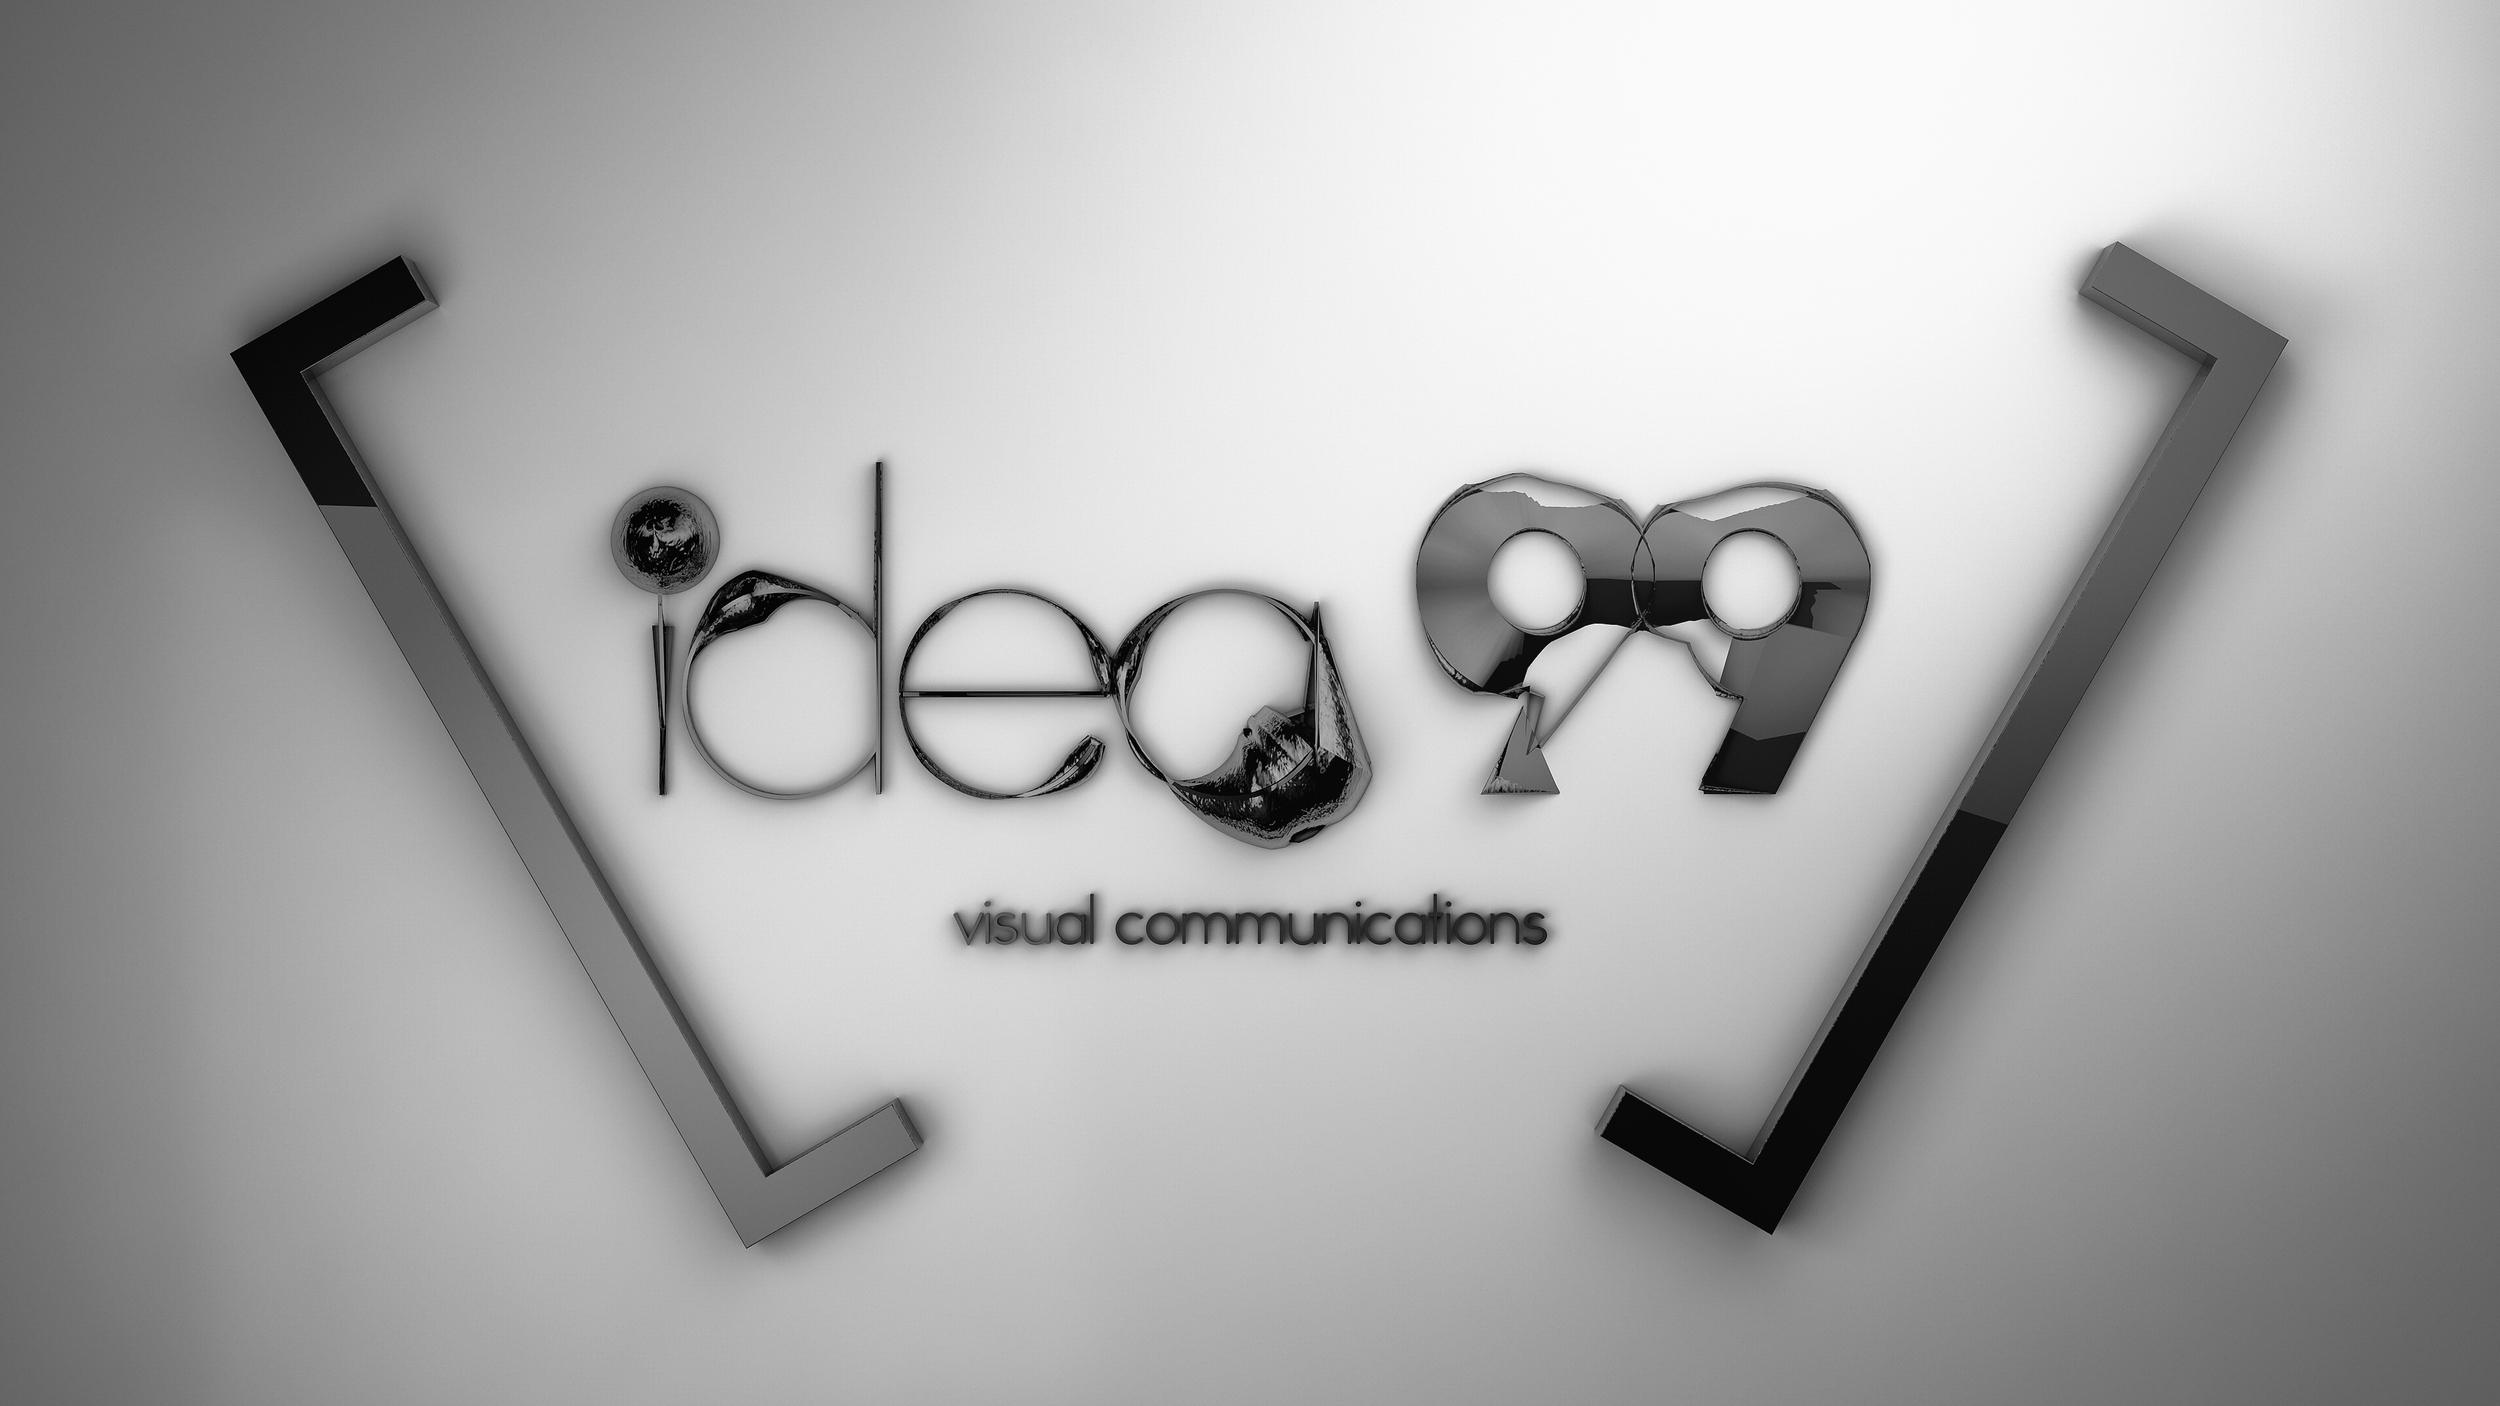 idea 99 imgre2.jpg